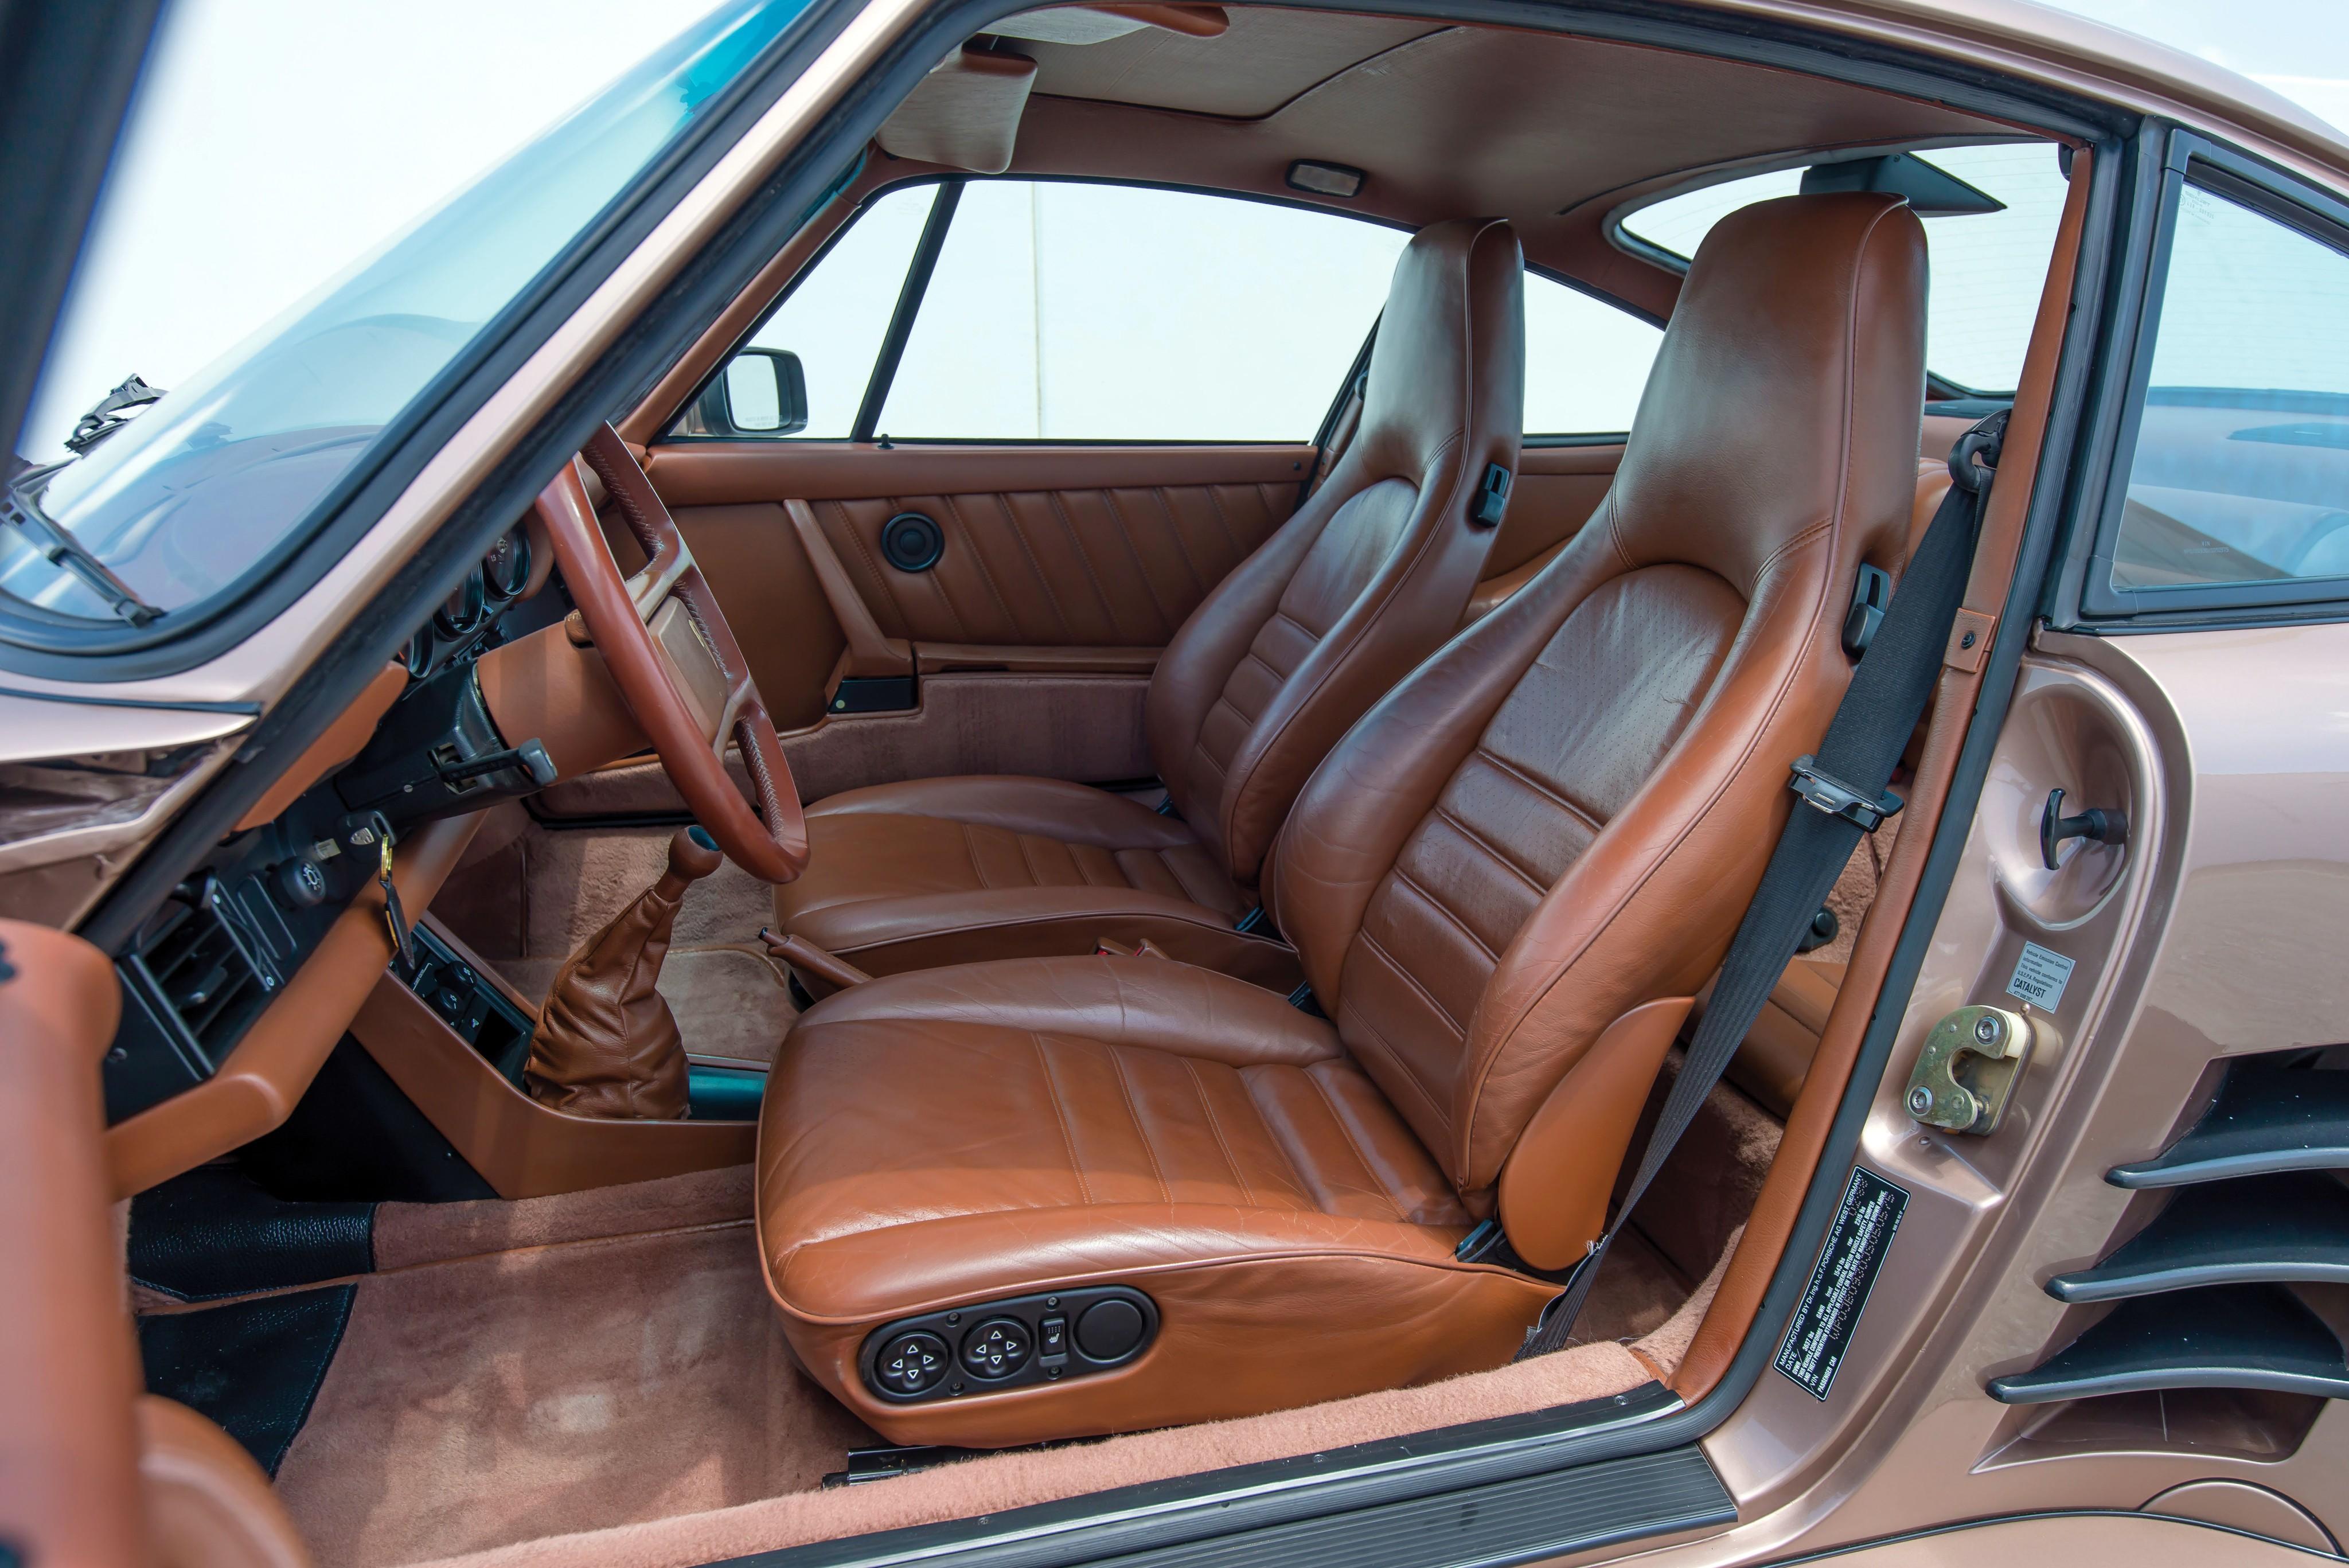 Porsche 911 Turbo Flachbau 930 Specs Photos 1981 1982 1983 1984 1985 1986 1987 1988 1989 Autoevolution